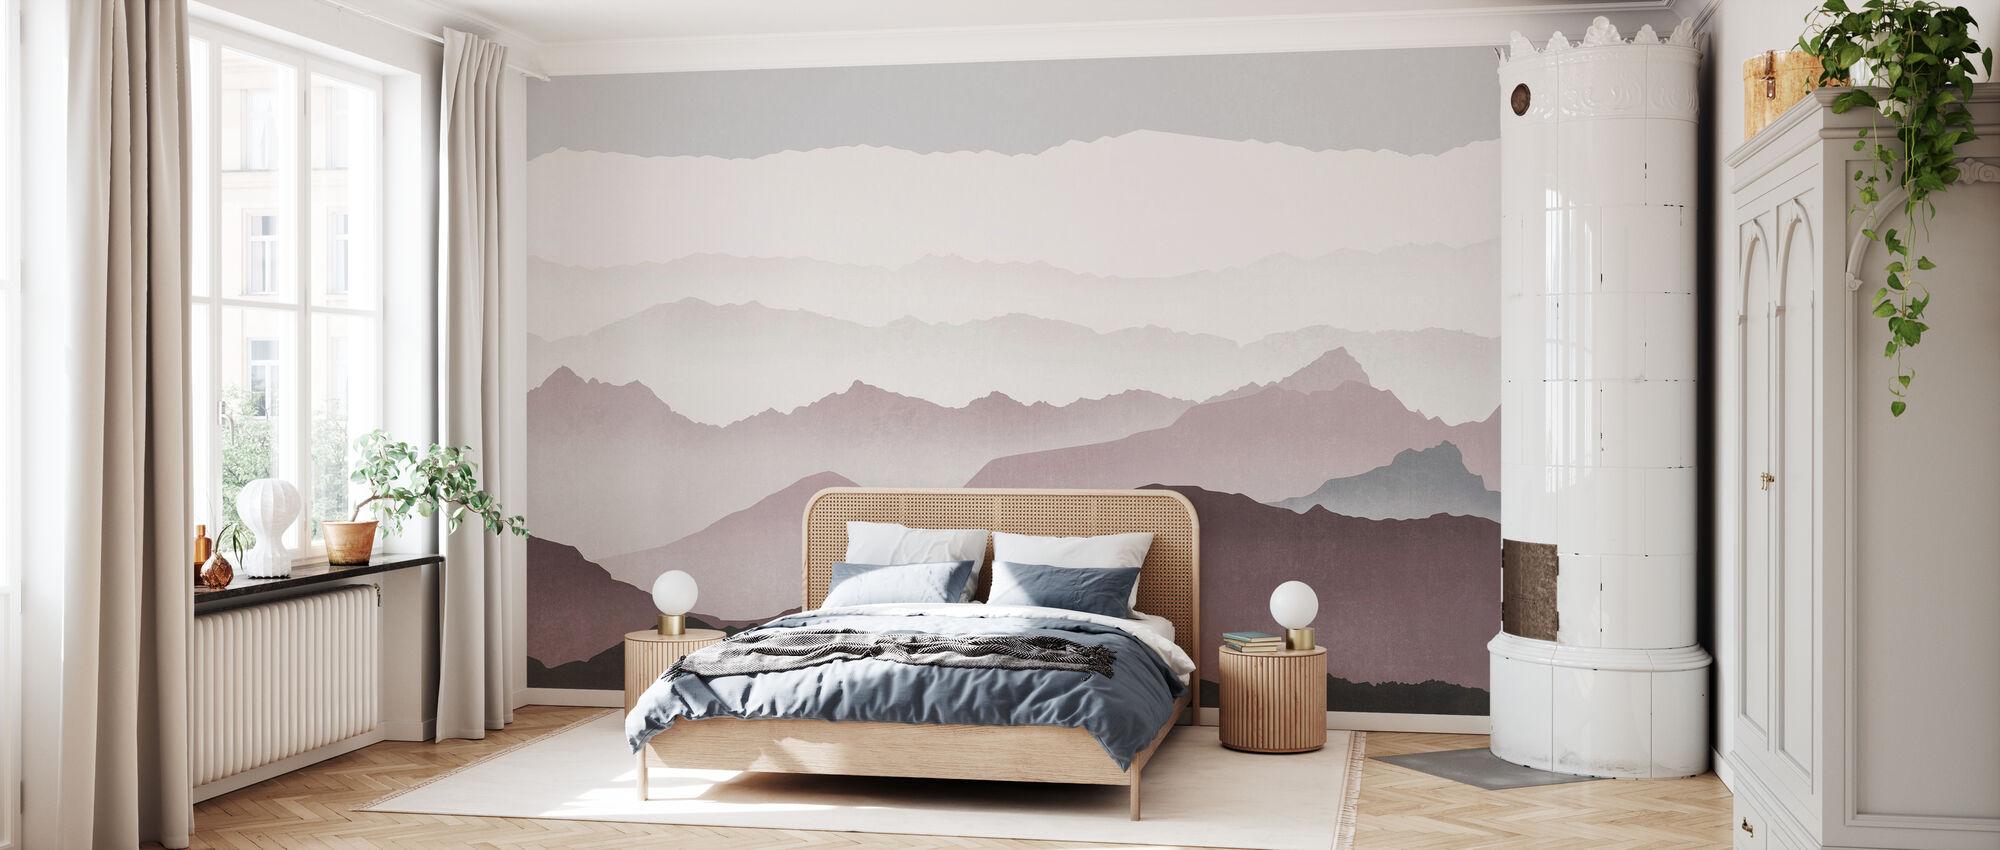 Paisaje Misty - Ciruela - Papel pintado - Dormitorio